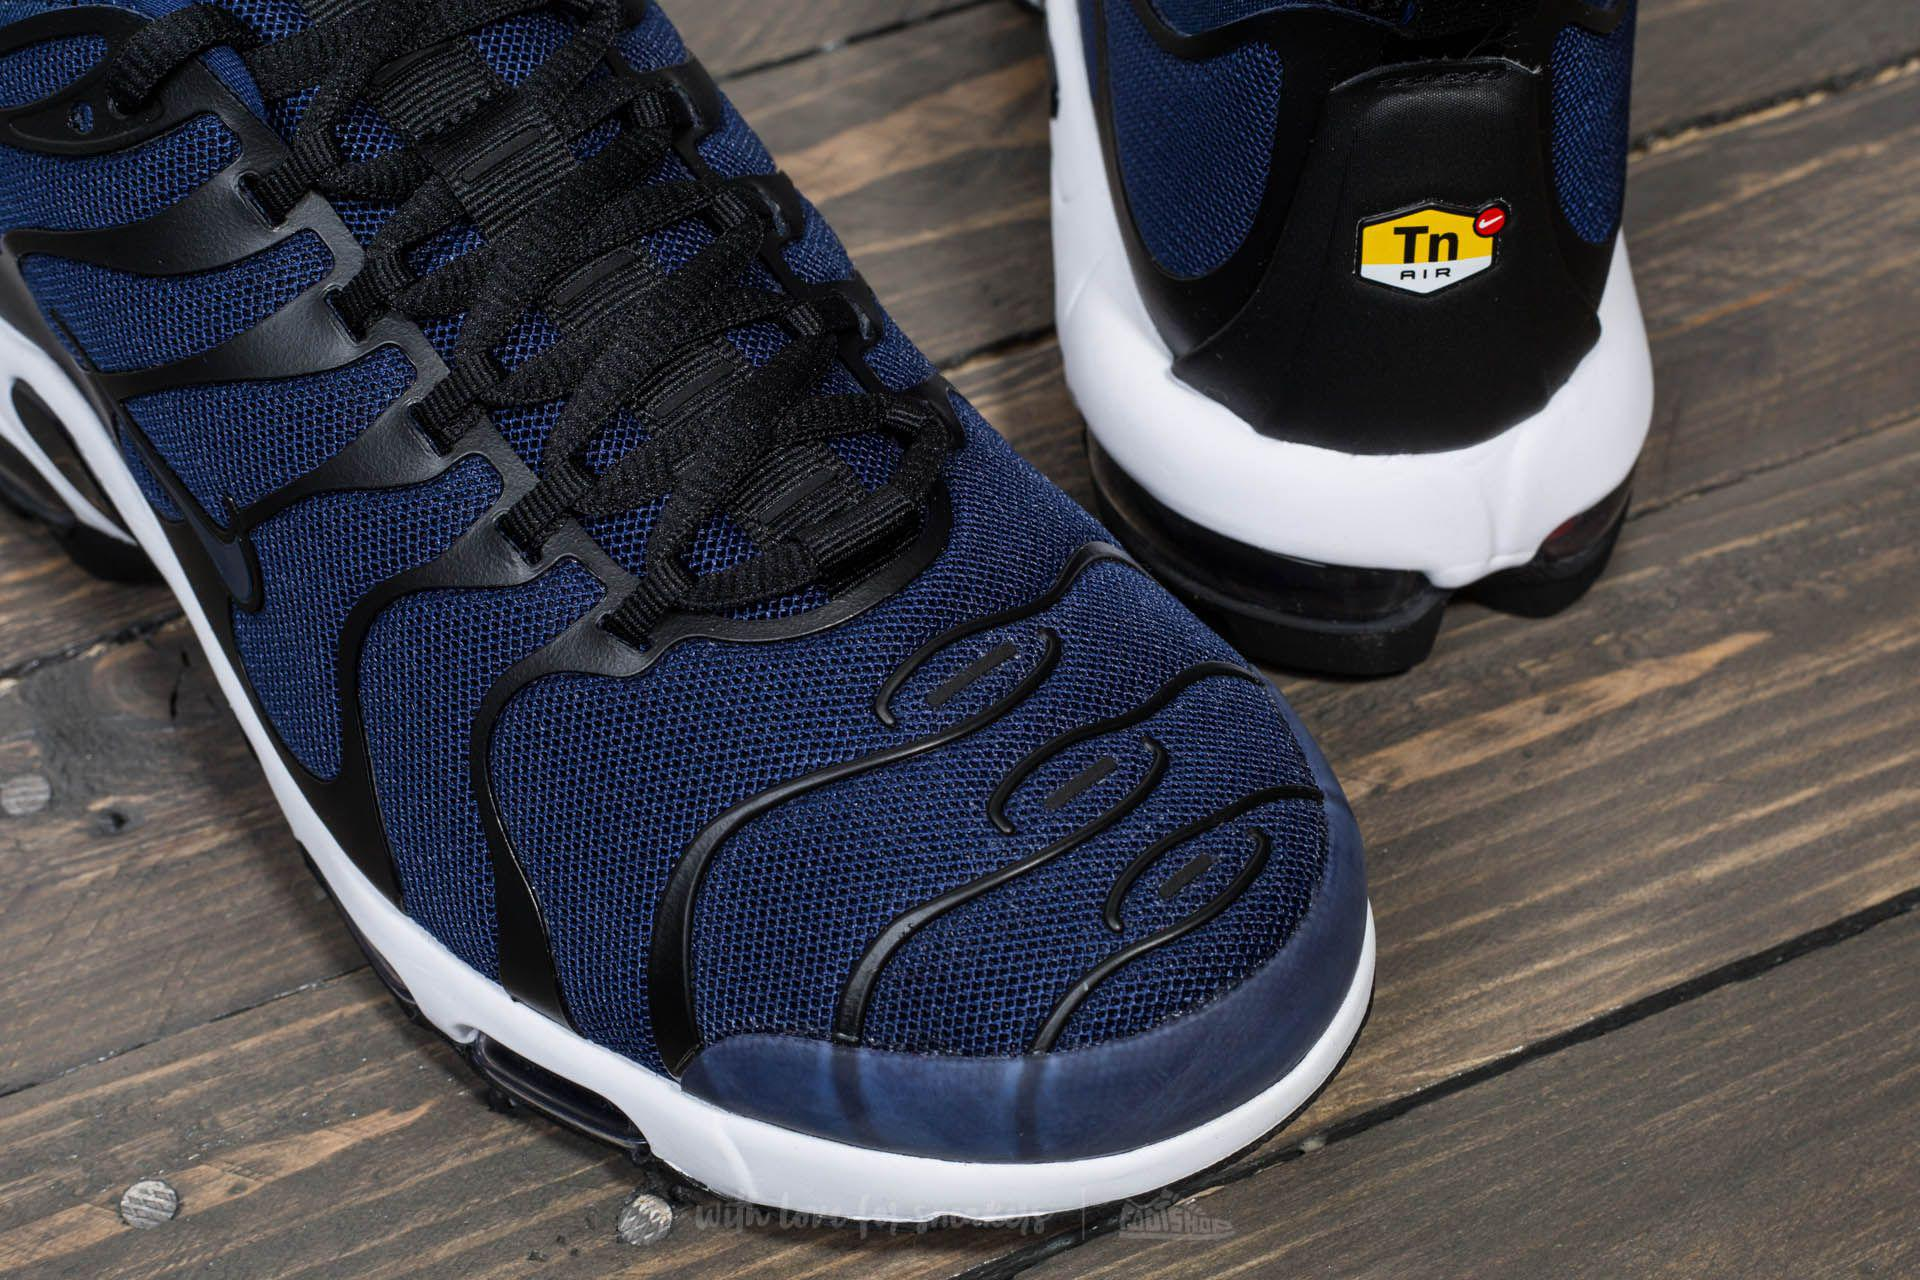 Nike Wmns Air Max Plus Tn Ultra Binary Blue Binary Blue Black Lyst